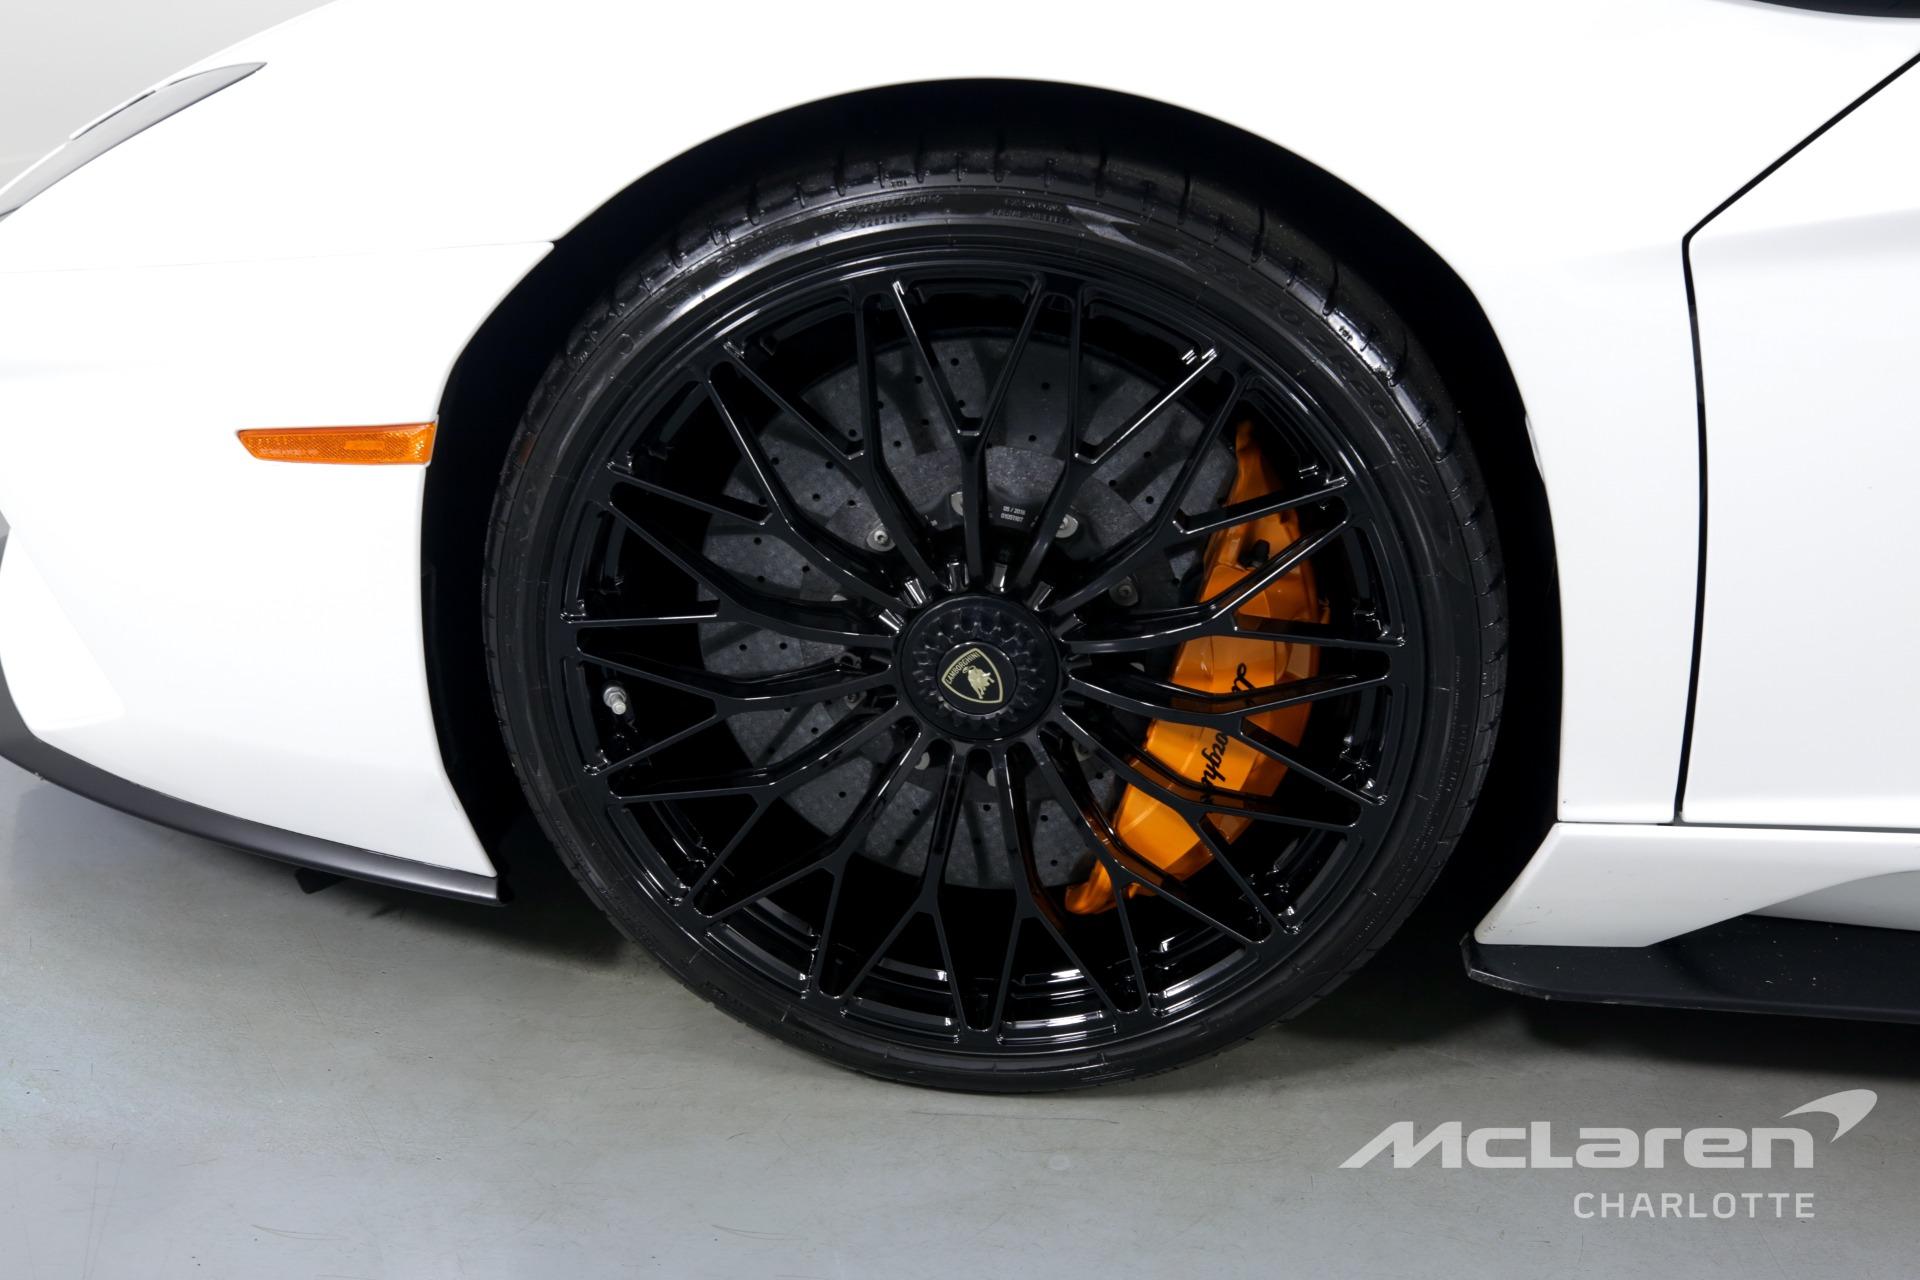 Used 2018 Lamborghini Aventador LP 740-4 S | Charlotte, NC